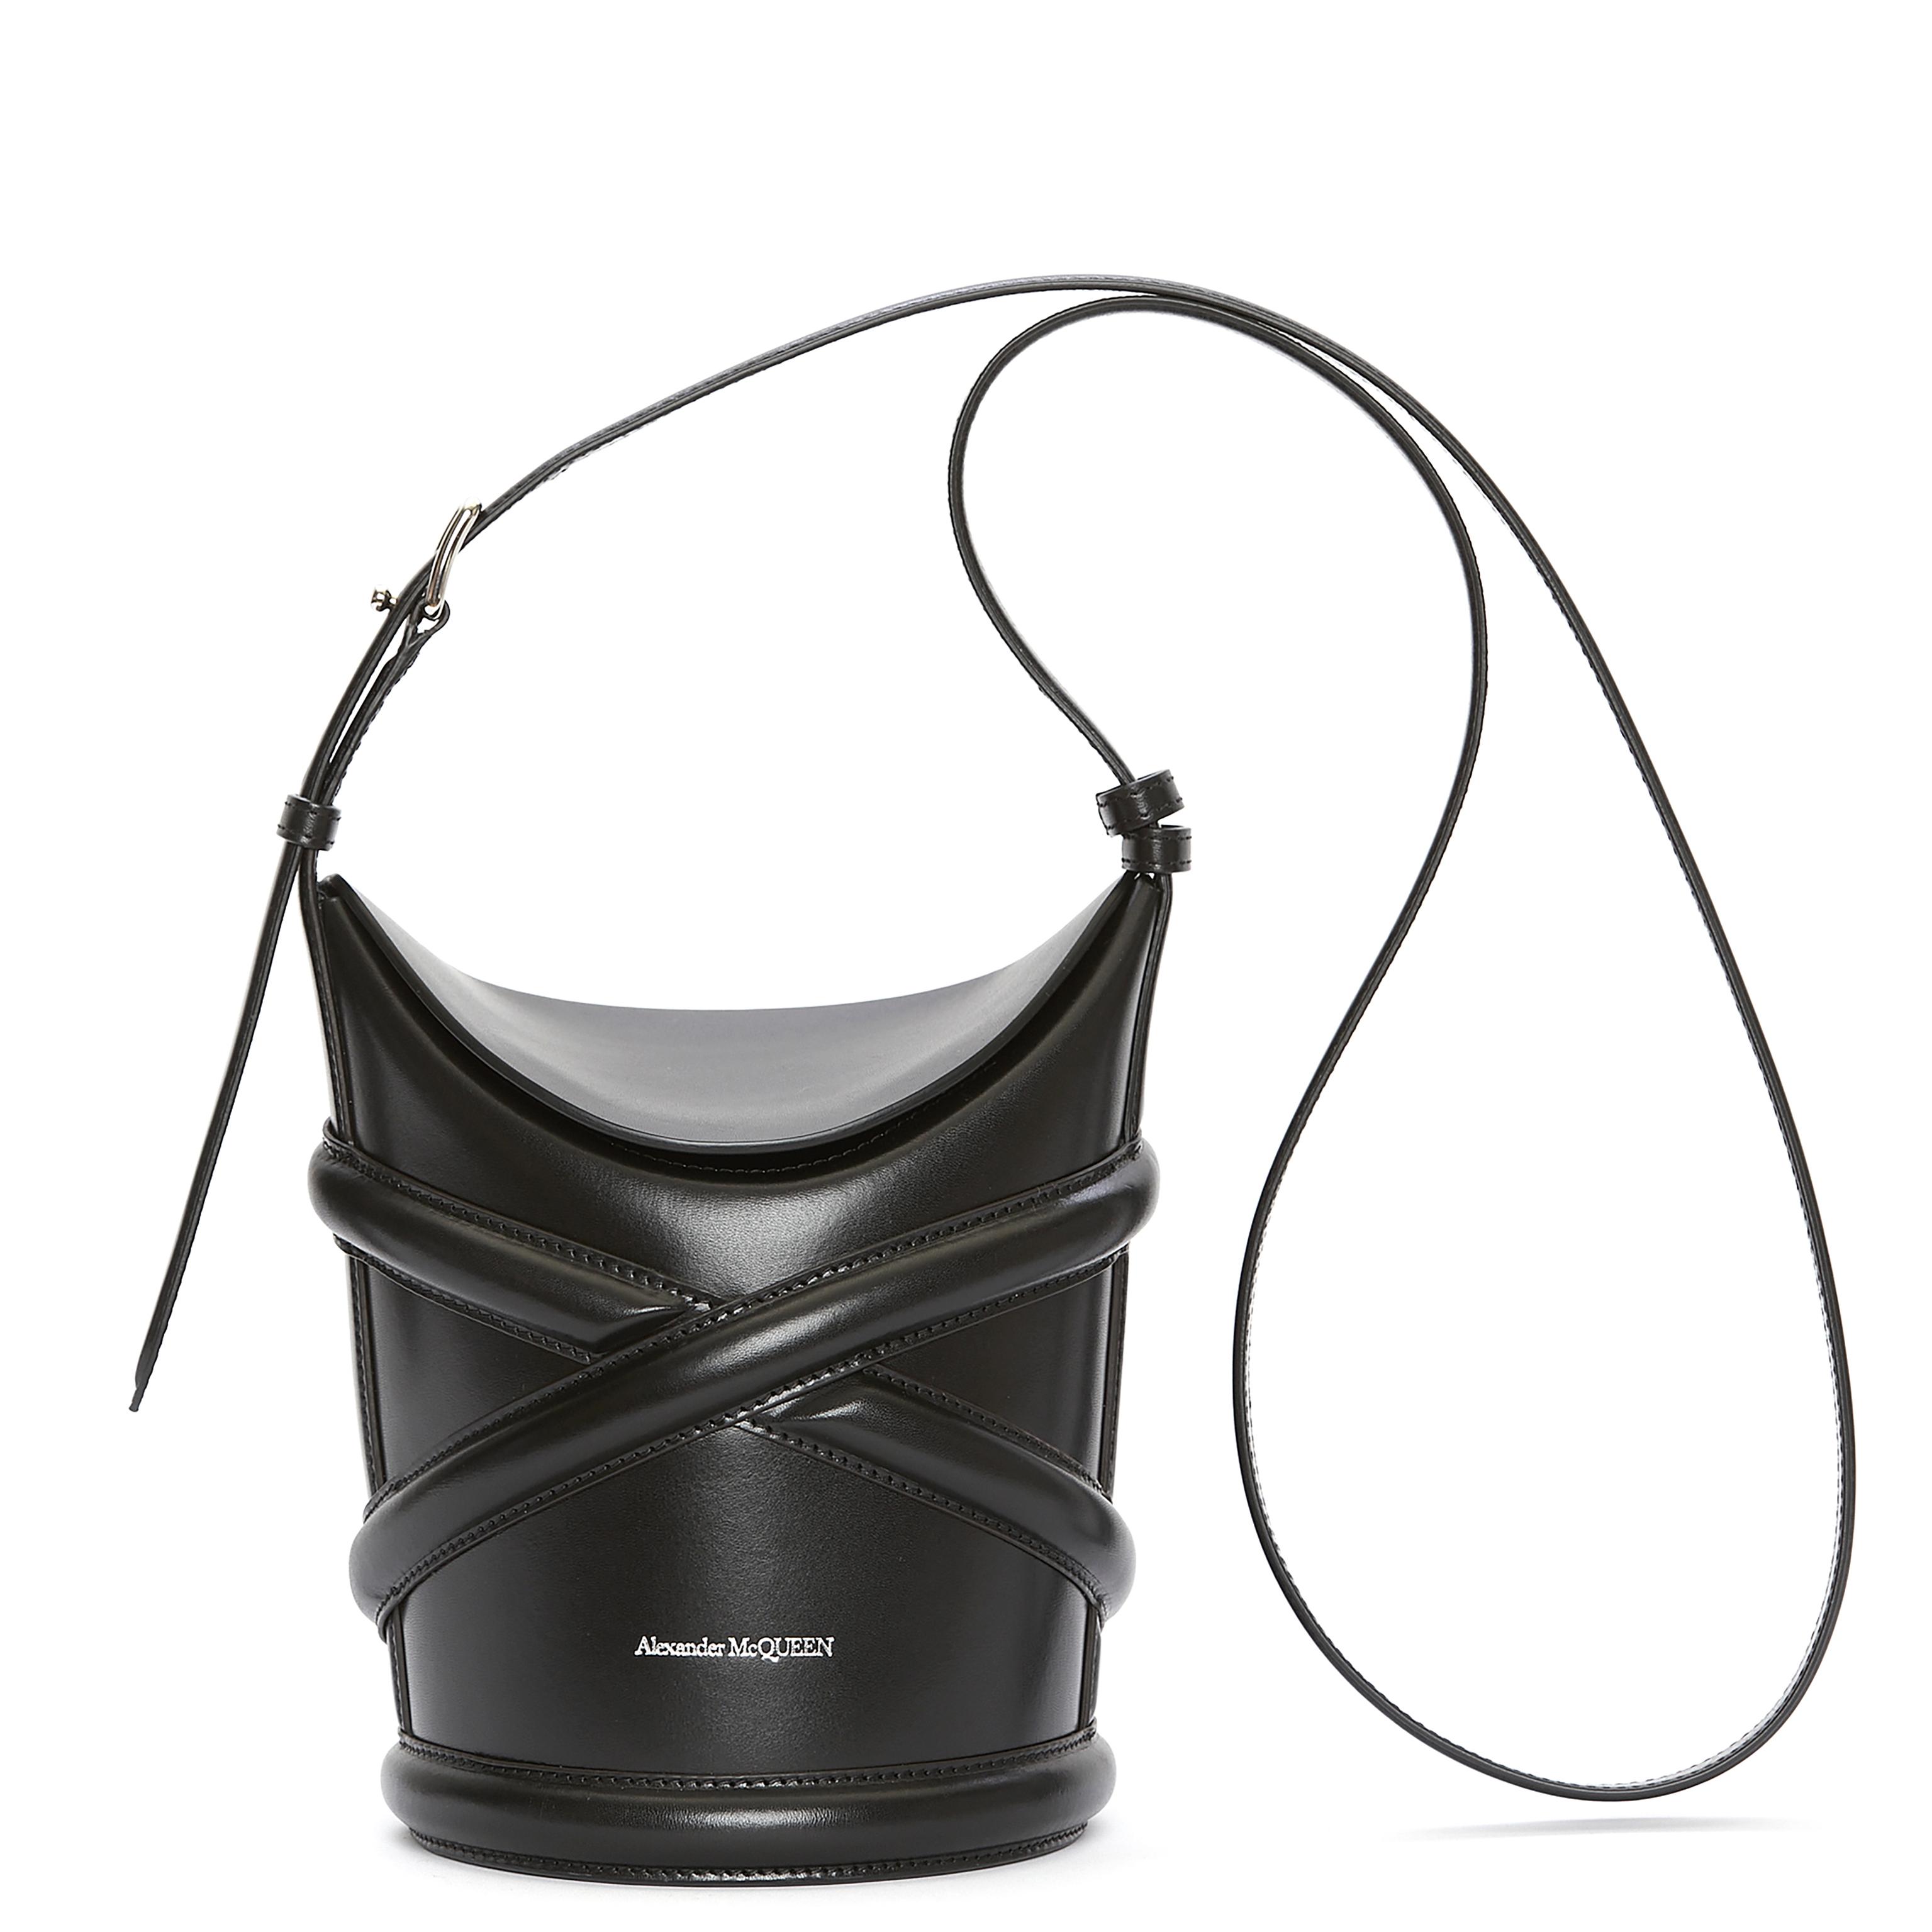 Alexander McQueen Curve Bag Black